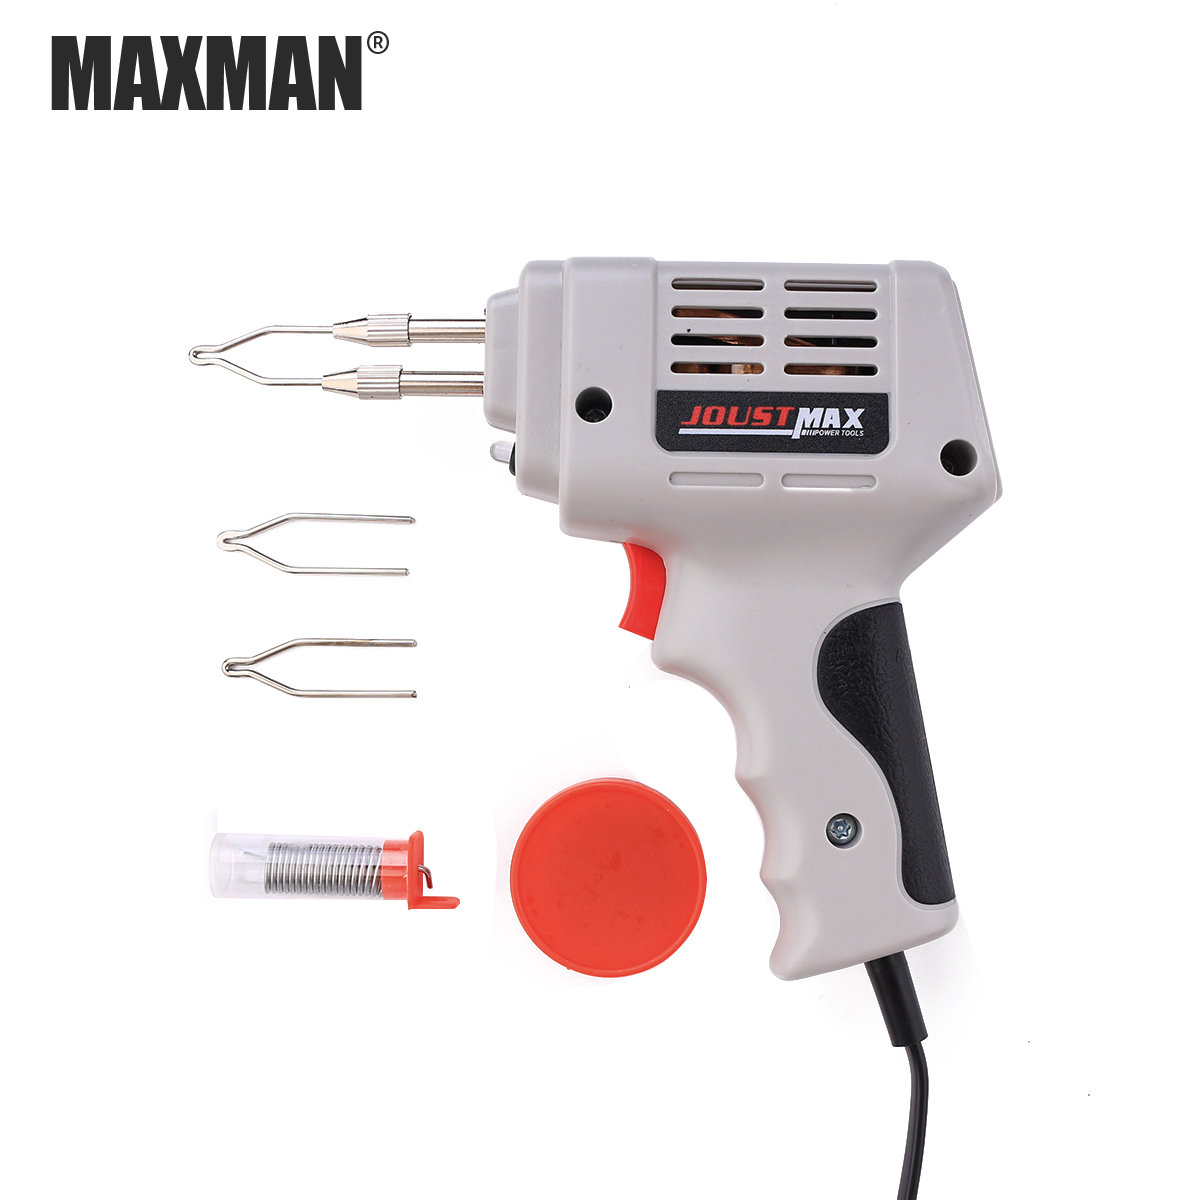 MAXMAN 220V Tin Soldering Iron Gun Accessories Manual Tin Gun Suction Tin Device Electric Welding Gun Tool Automatic